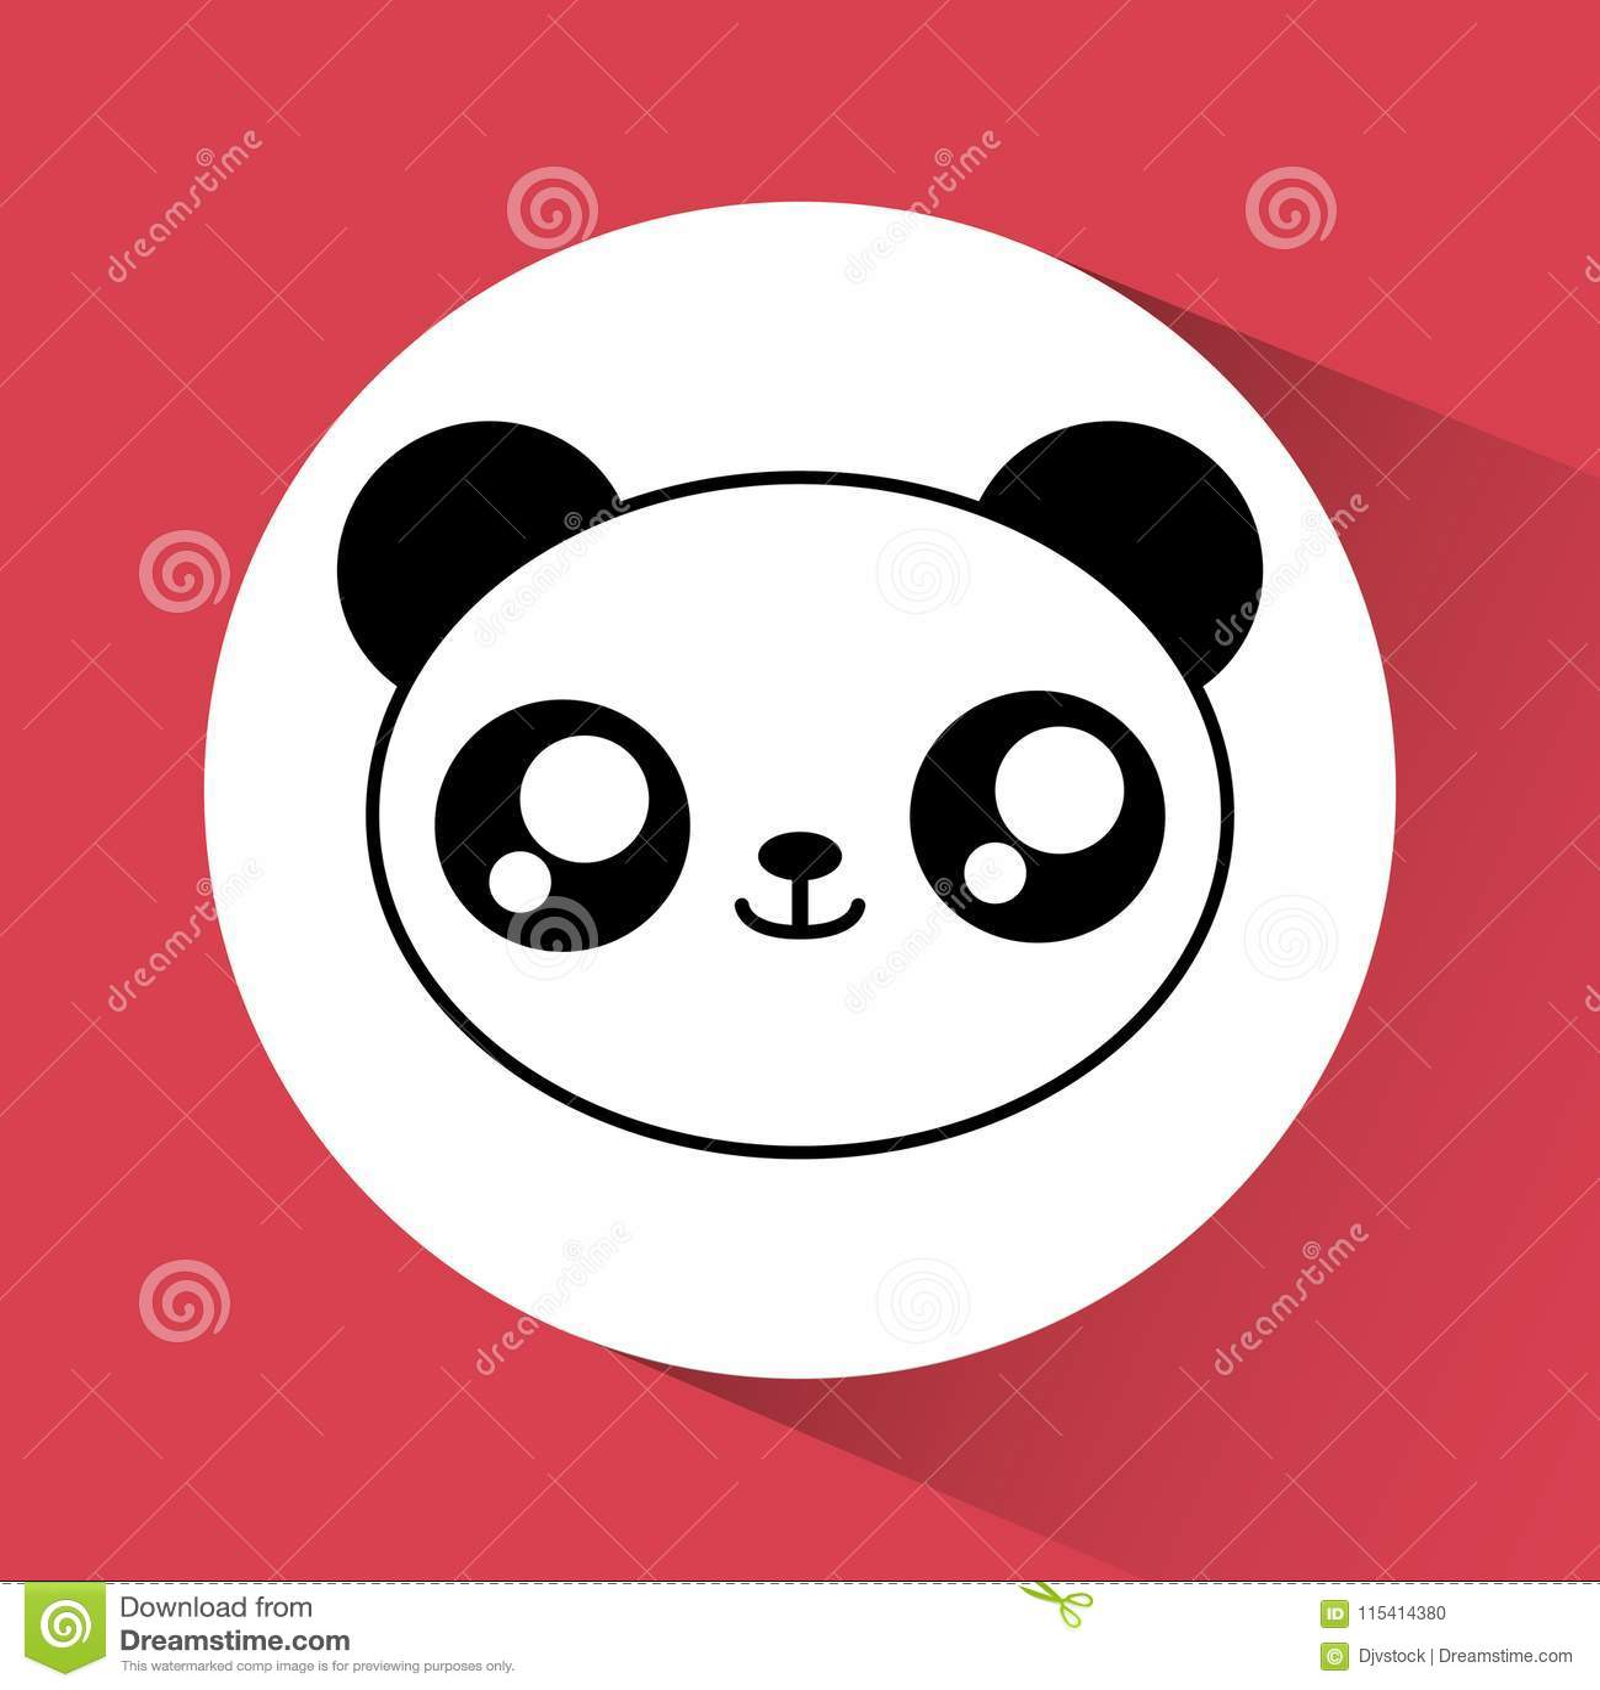 Coloriage de panda kawaii - Animal dessin ...